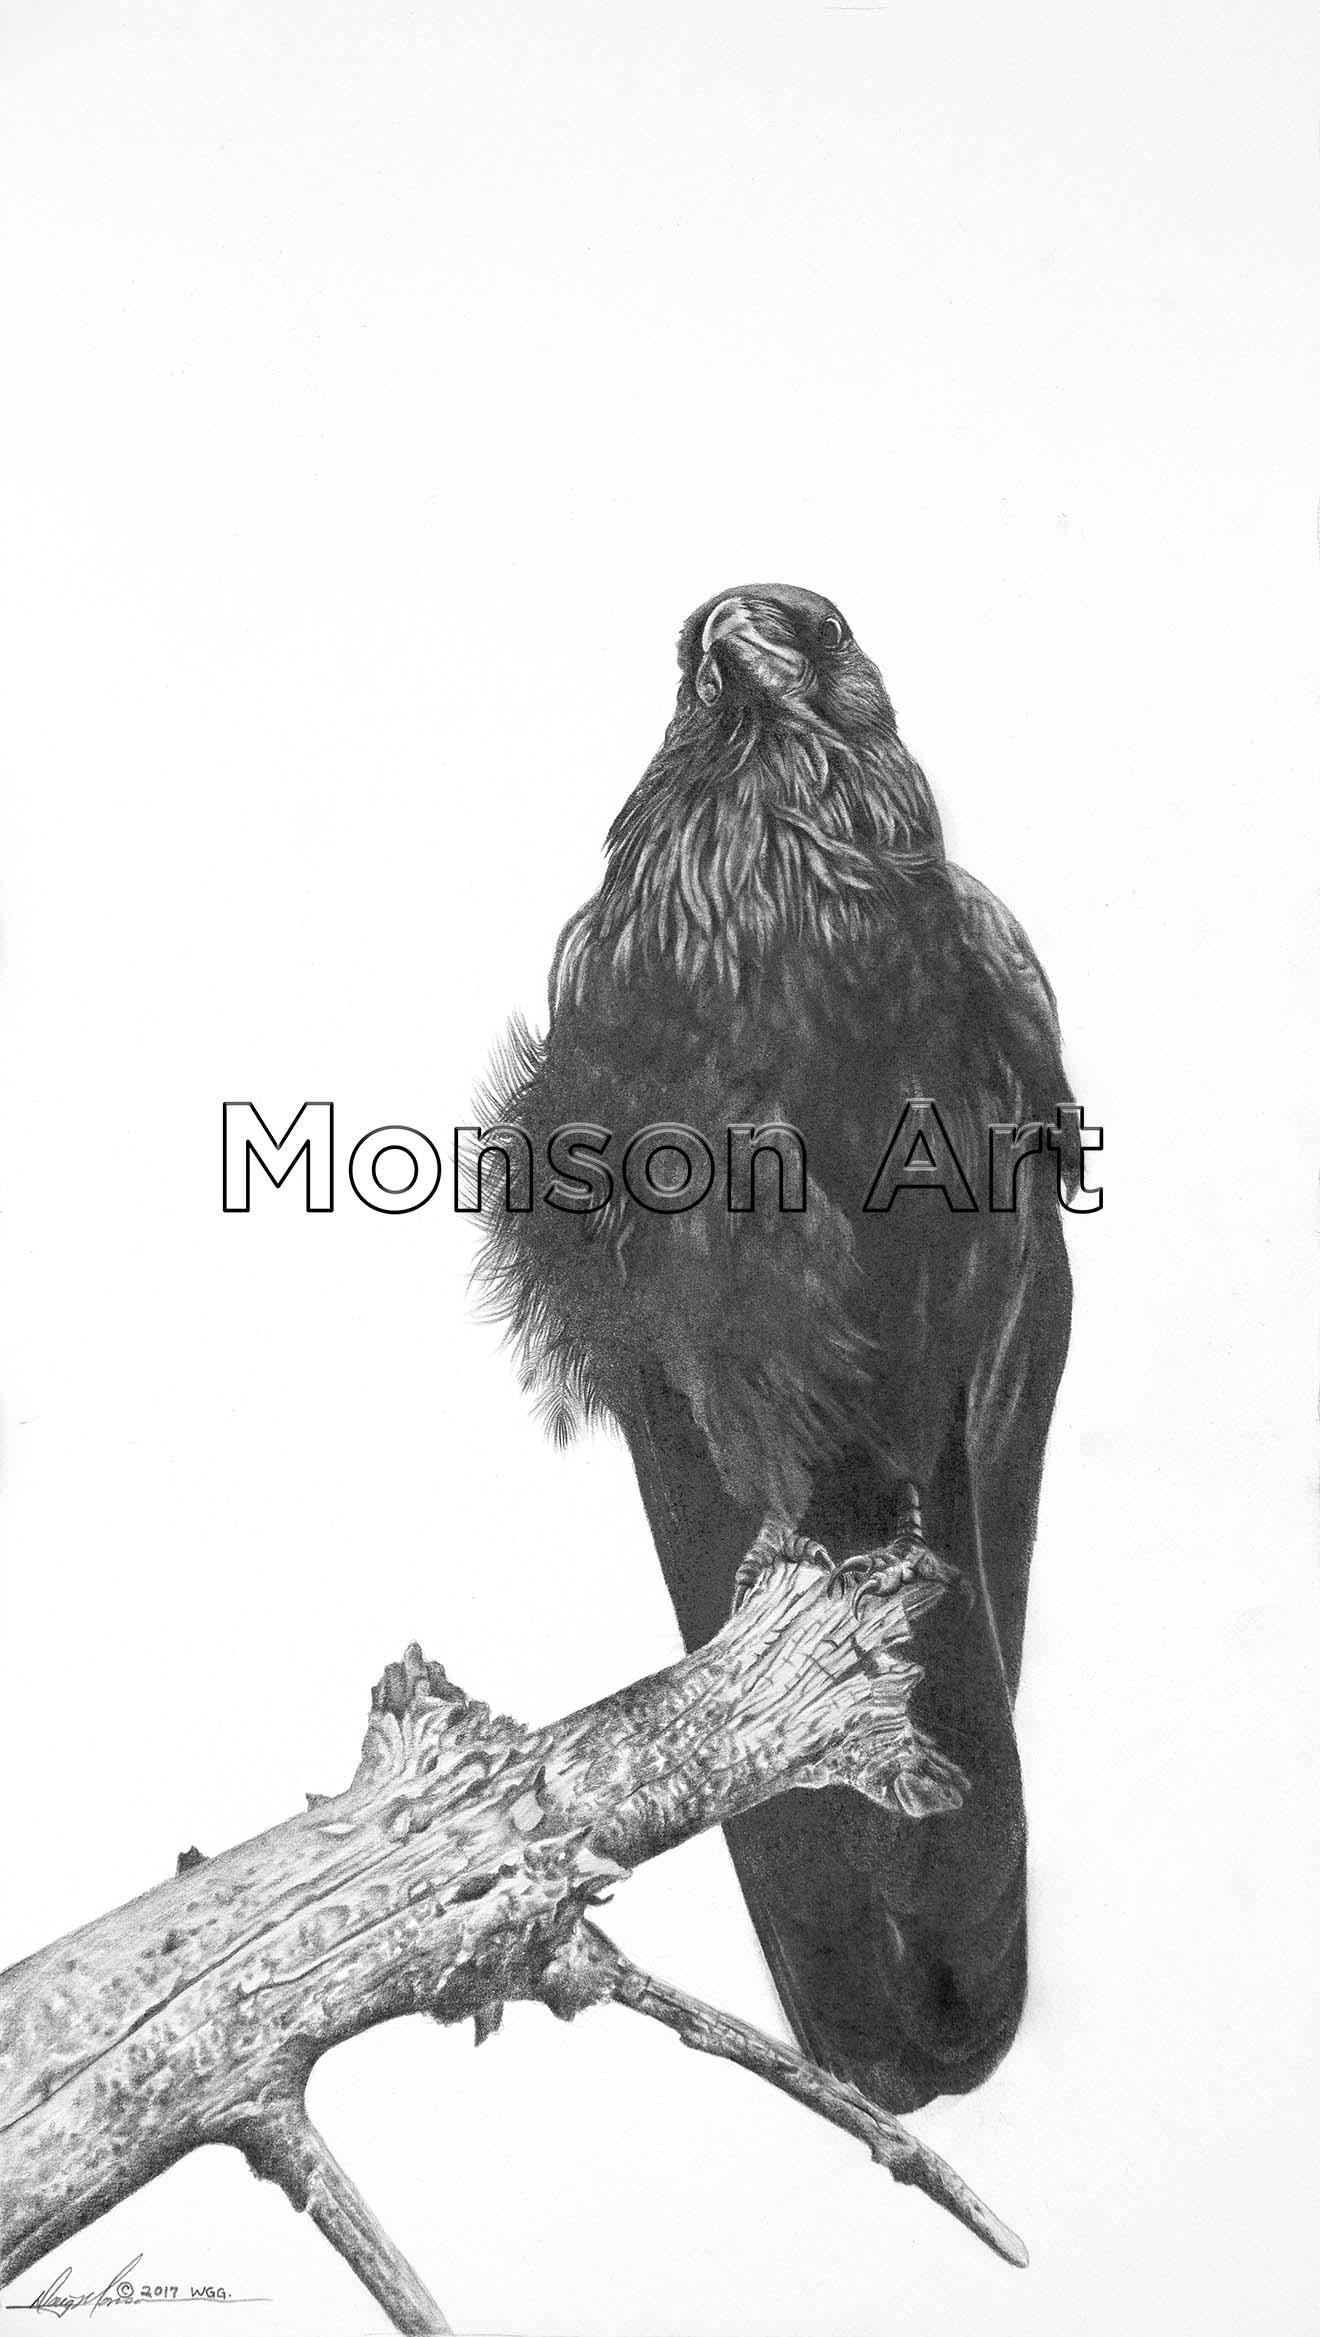 Monson170207-01